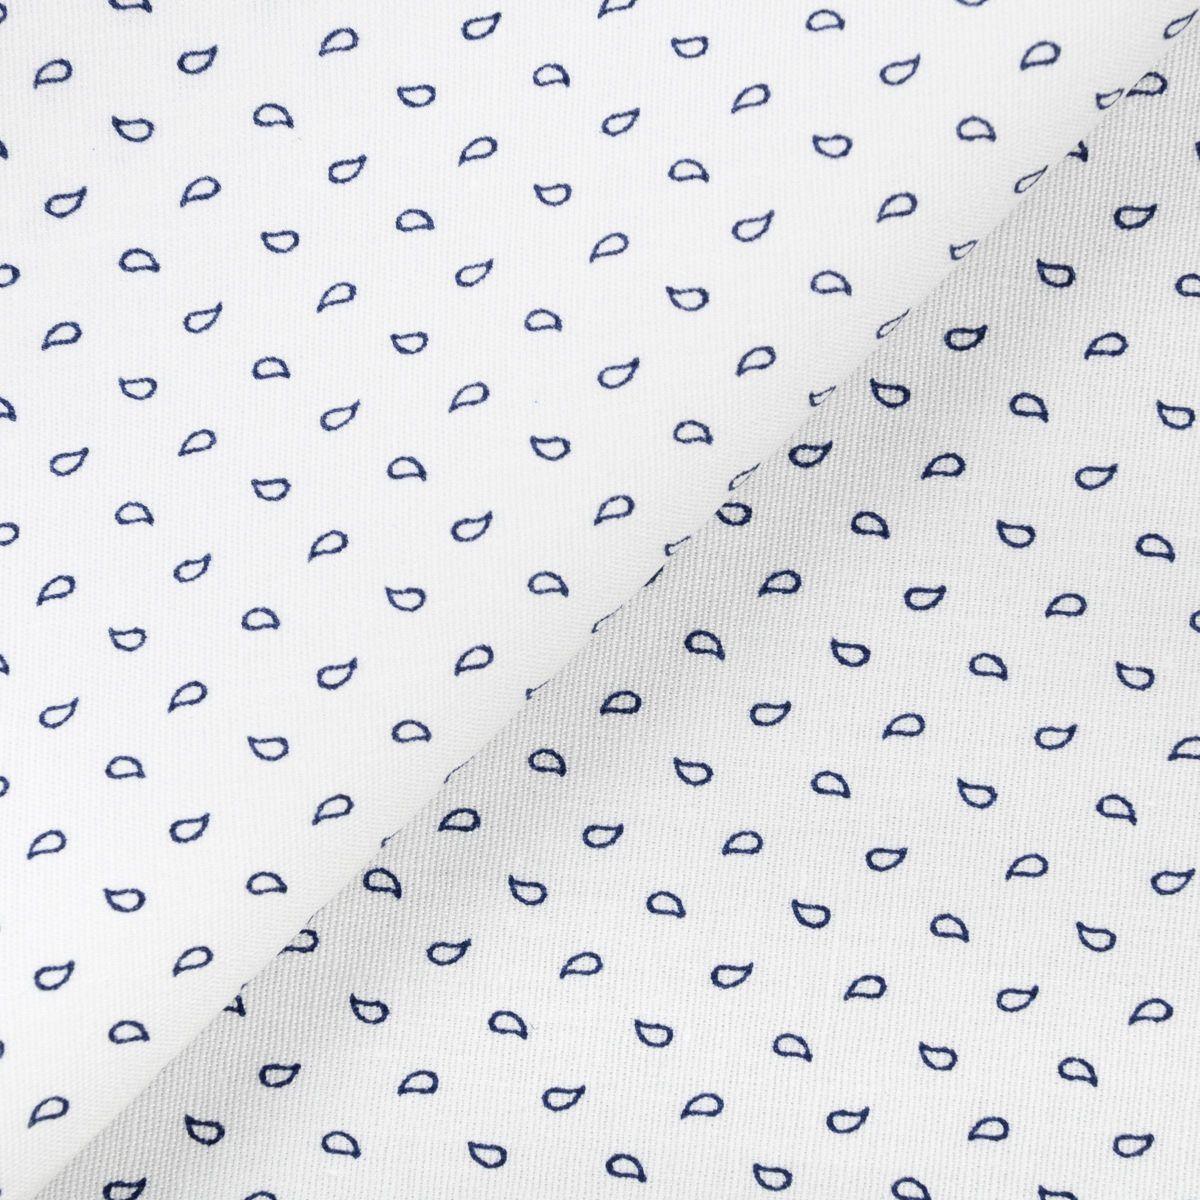 3606a0332cb $9.99/metre POPLIN SHIRTING MOROCCO BLUES - WHITE - fashion - by categories  - fabrics